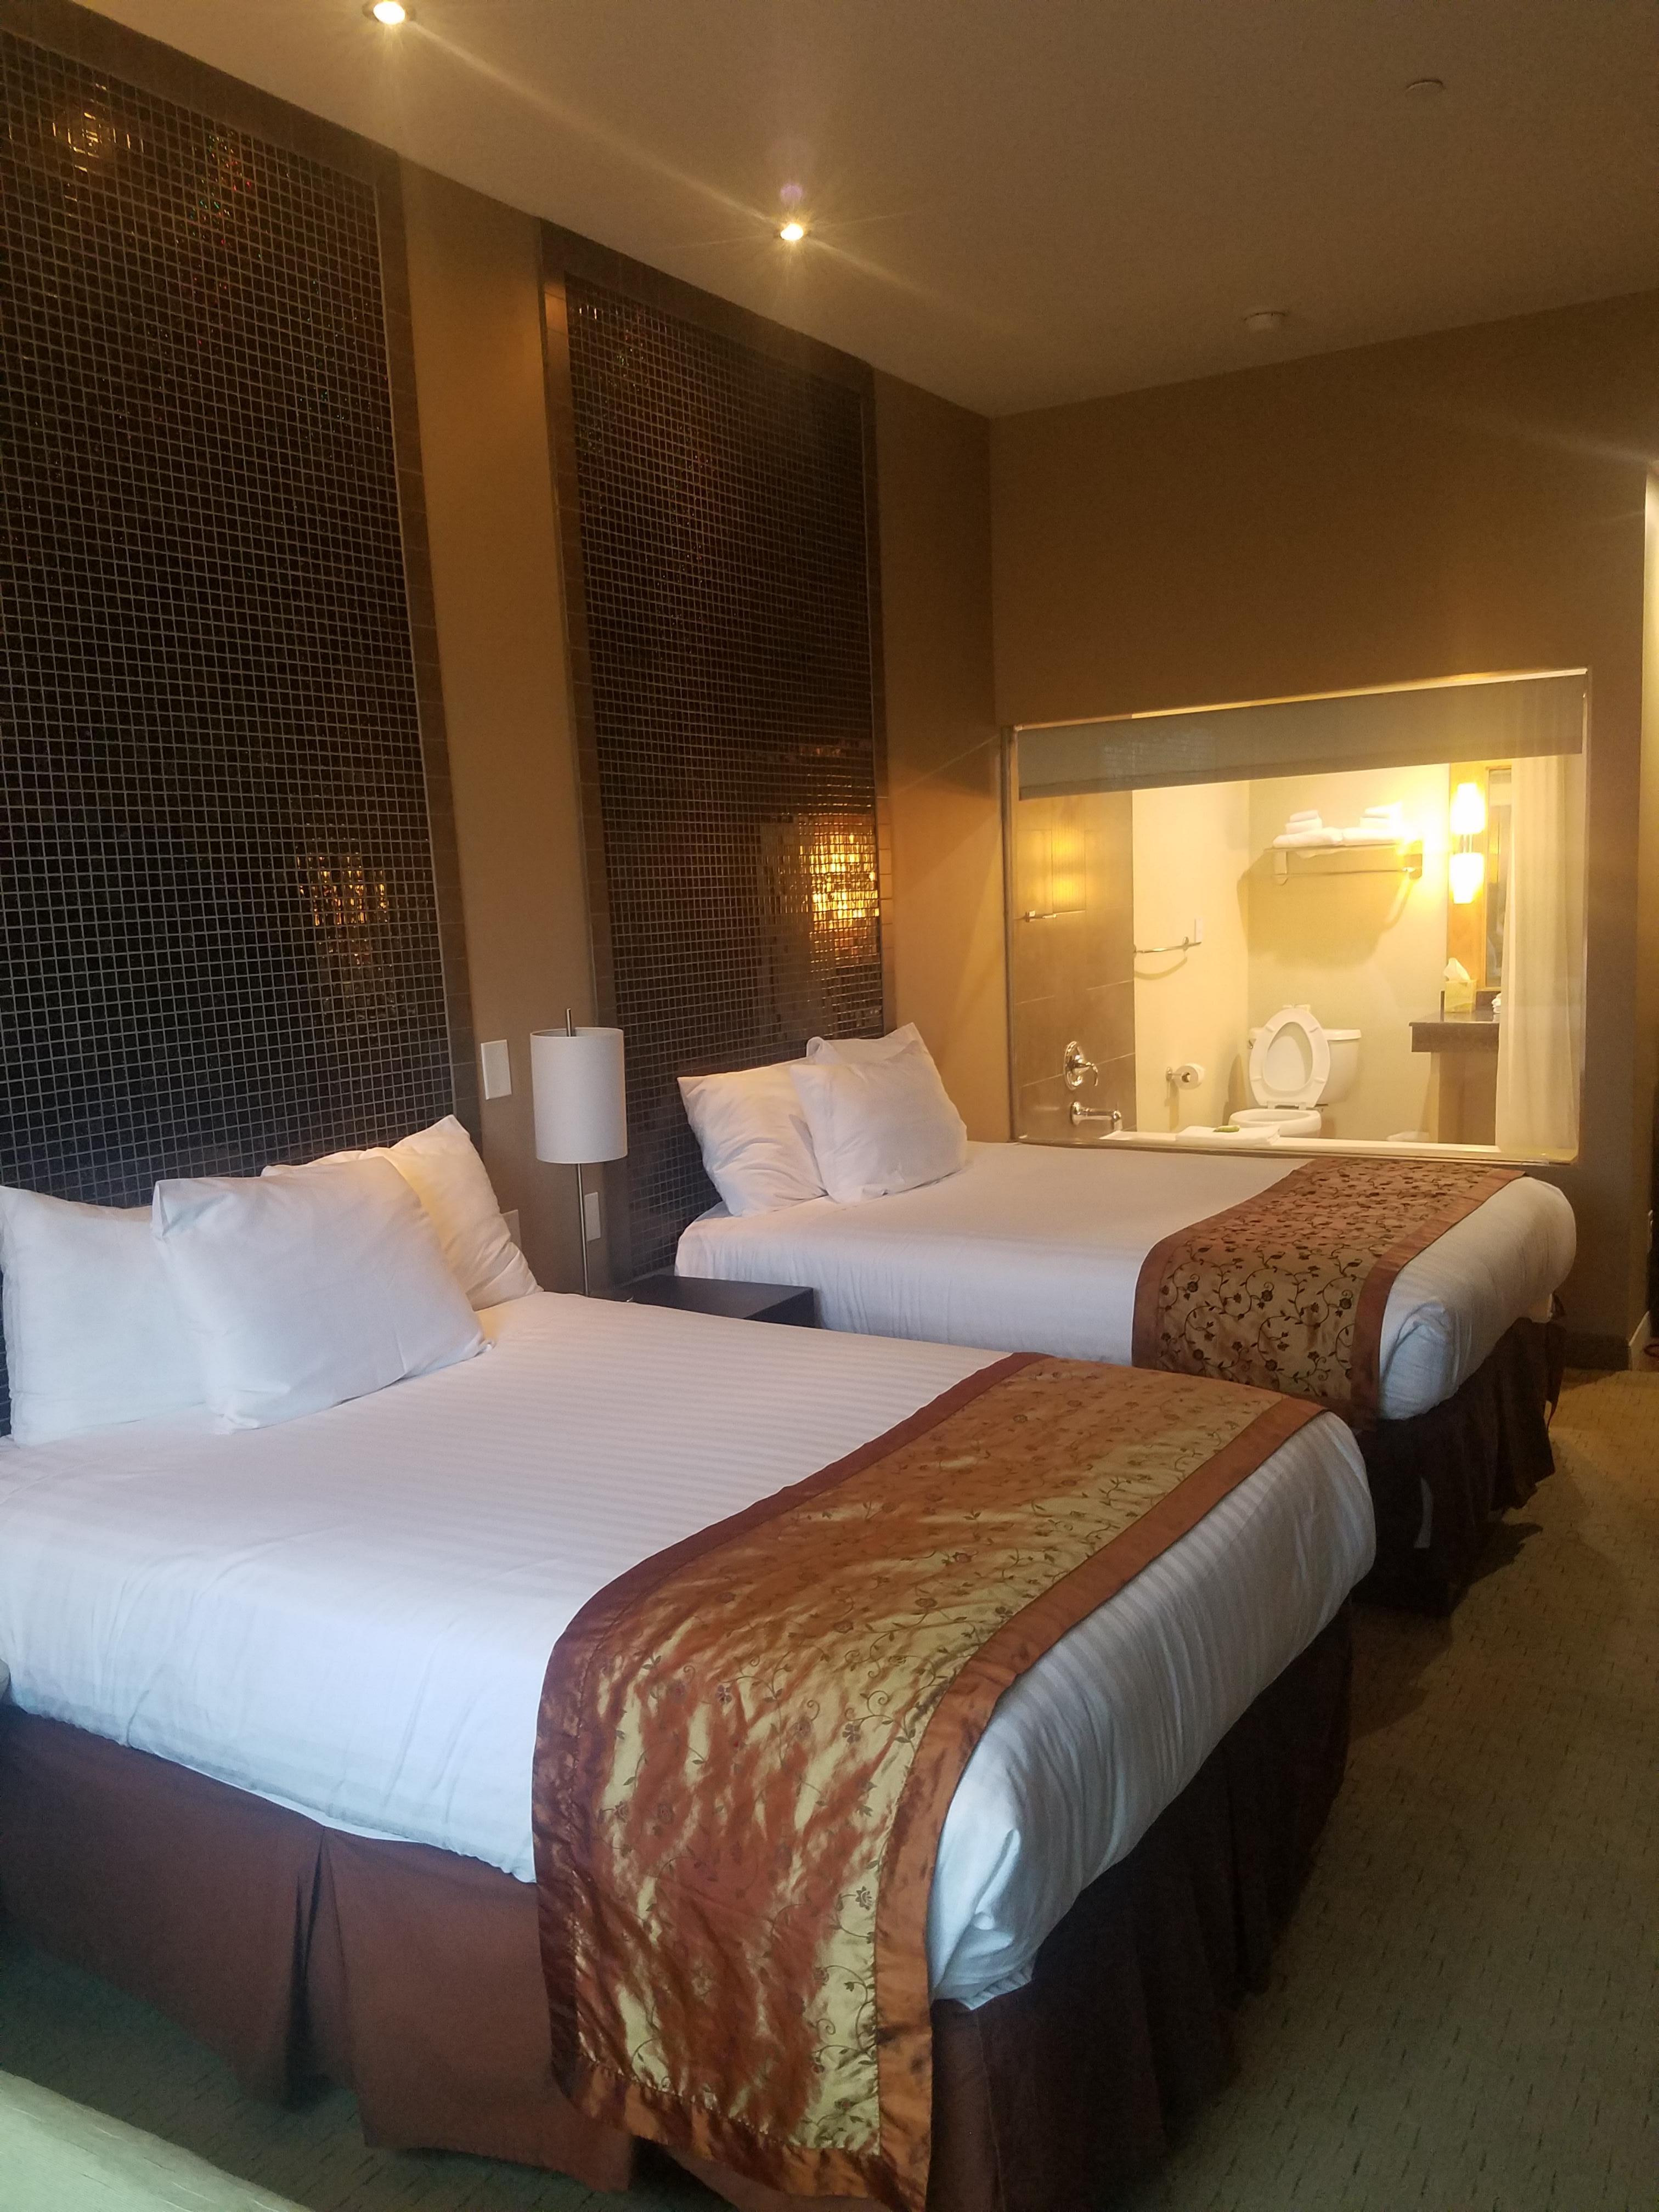 Casulo Hotel, Austin - Room Prices & Reviews | Travelocity